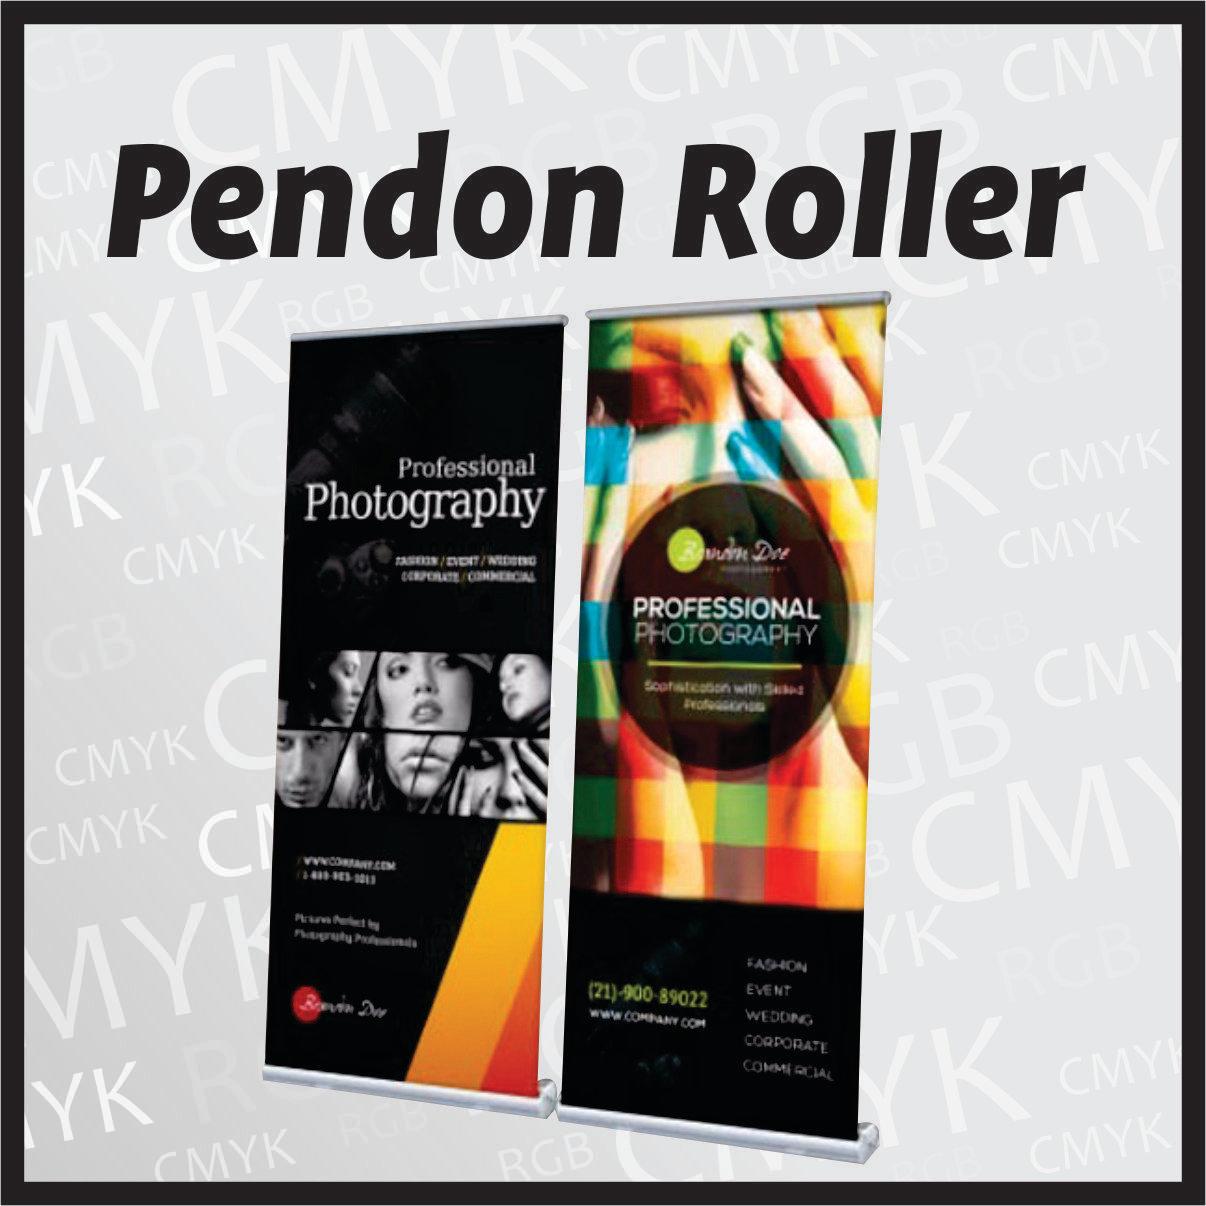 Pendon Roller